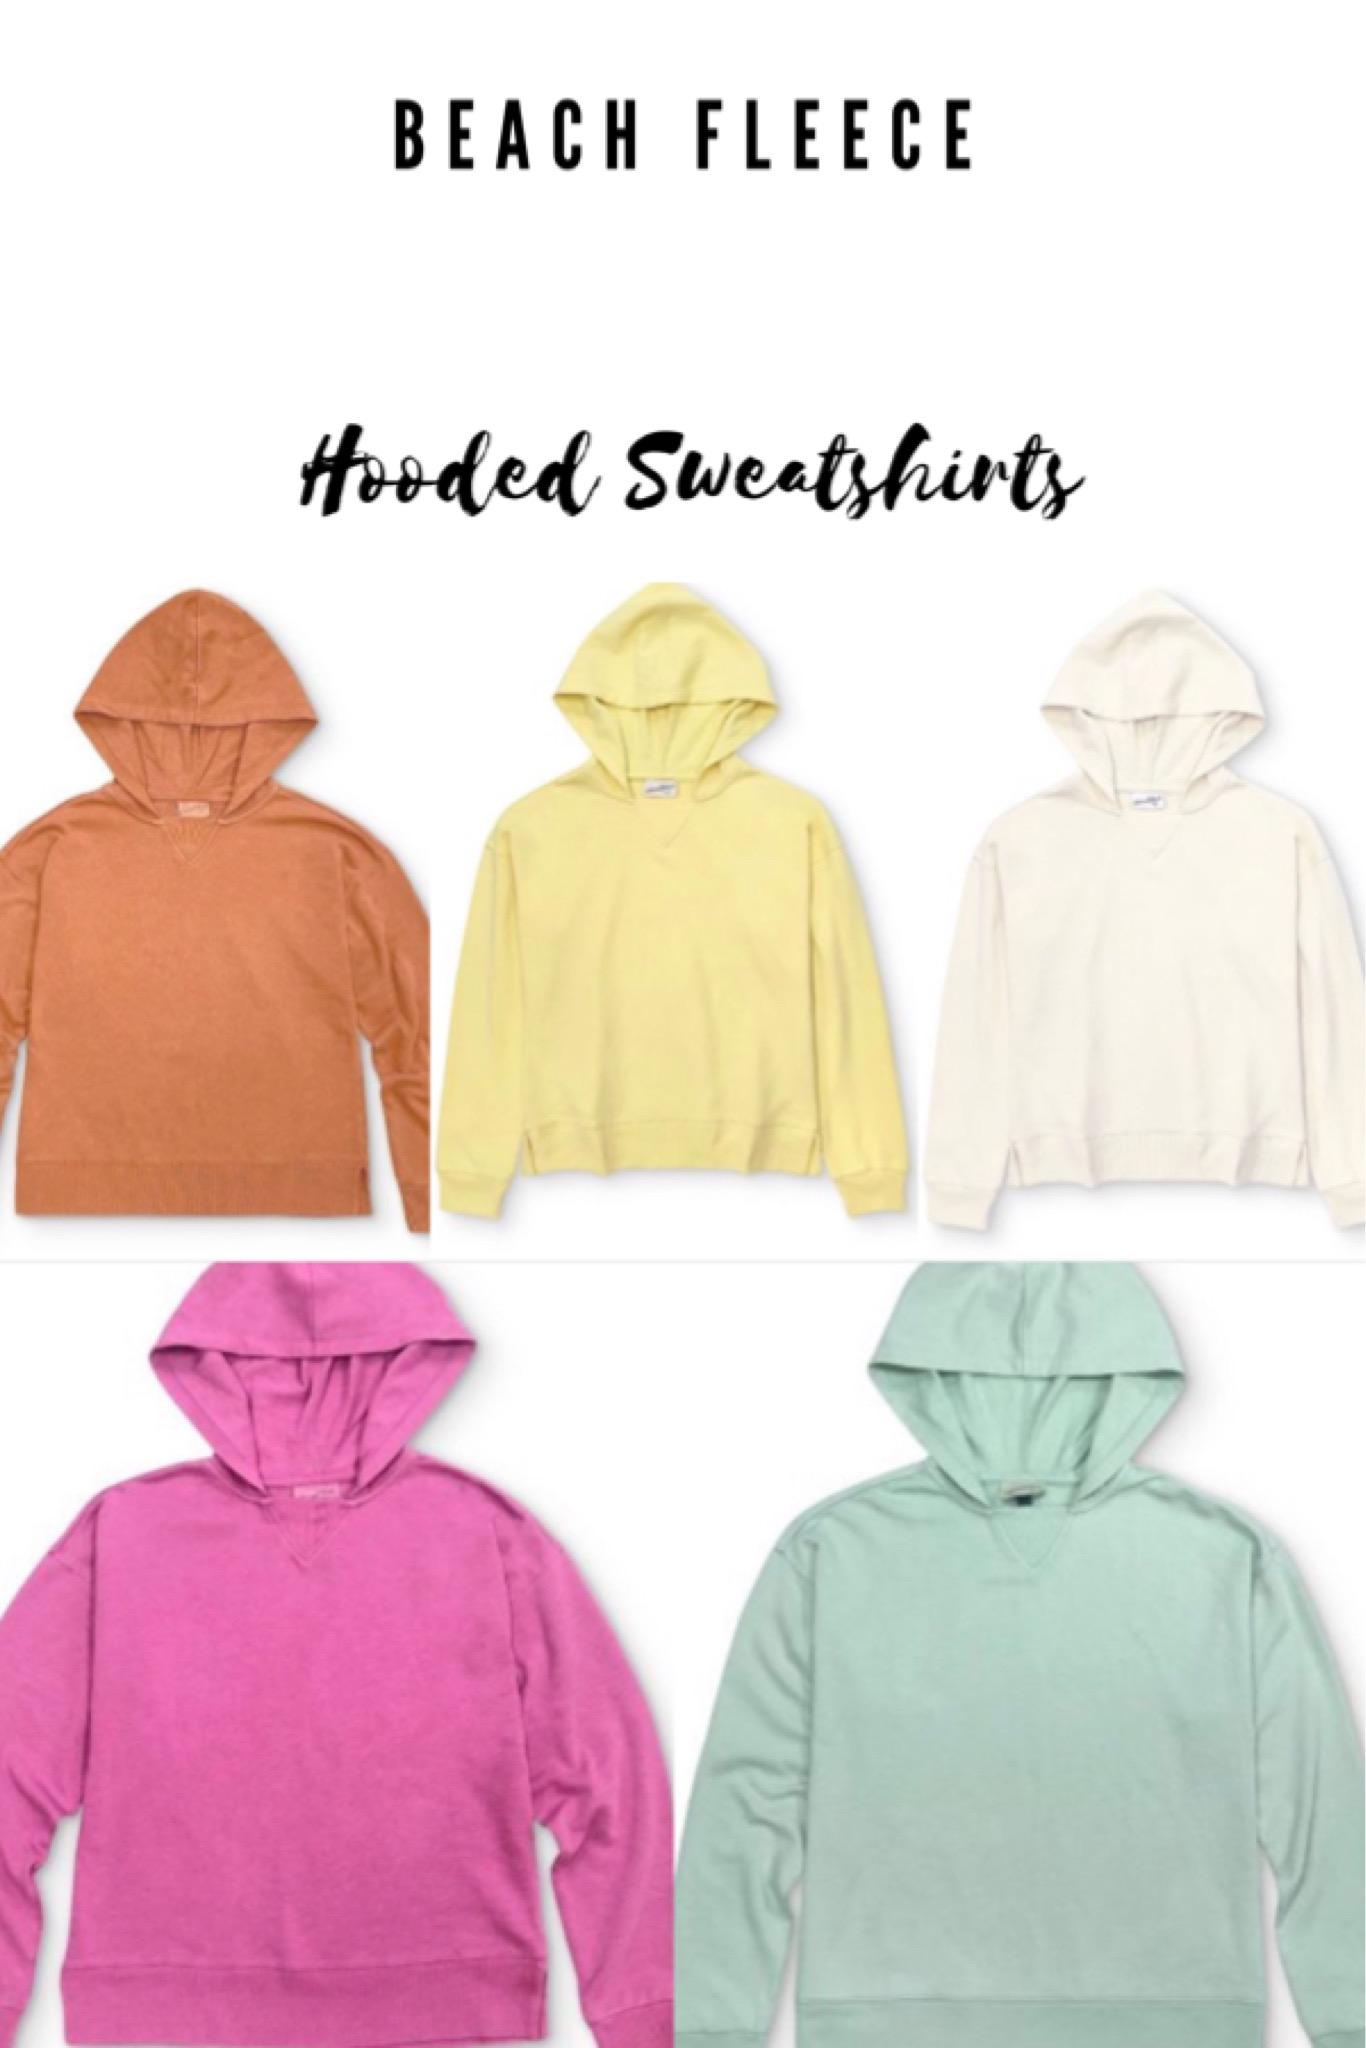 orange sweatshirt yellow sweatshirt white hoodie pink sweatshirt mint green sweatshirt